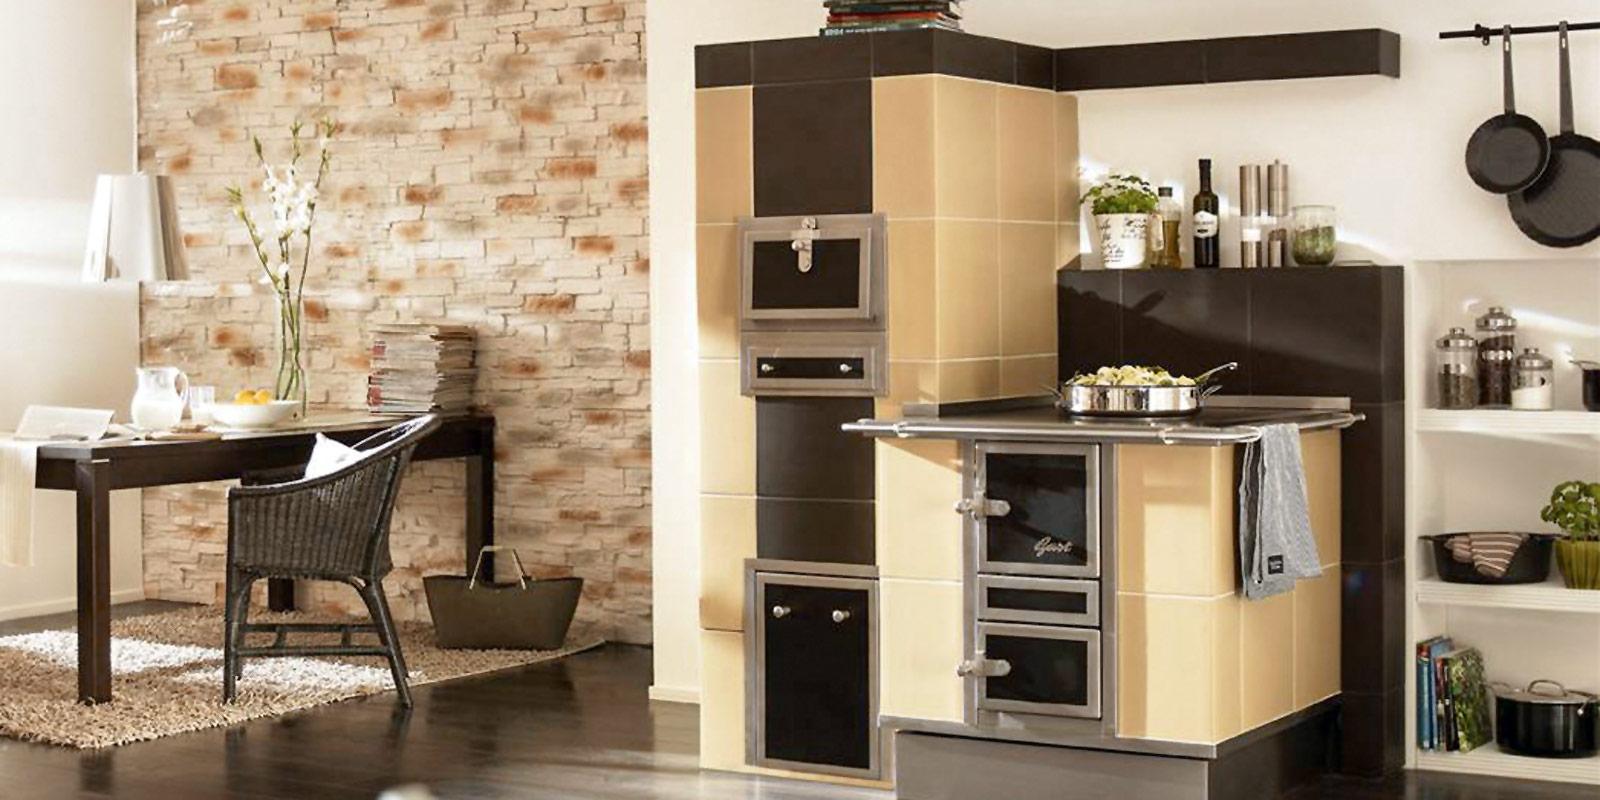 k chenherd pesenhofer kachelofen. Black Bedroom Furniture Sets. Home Design Ideas